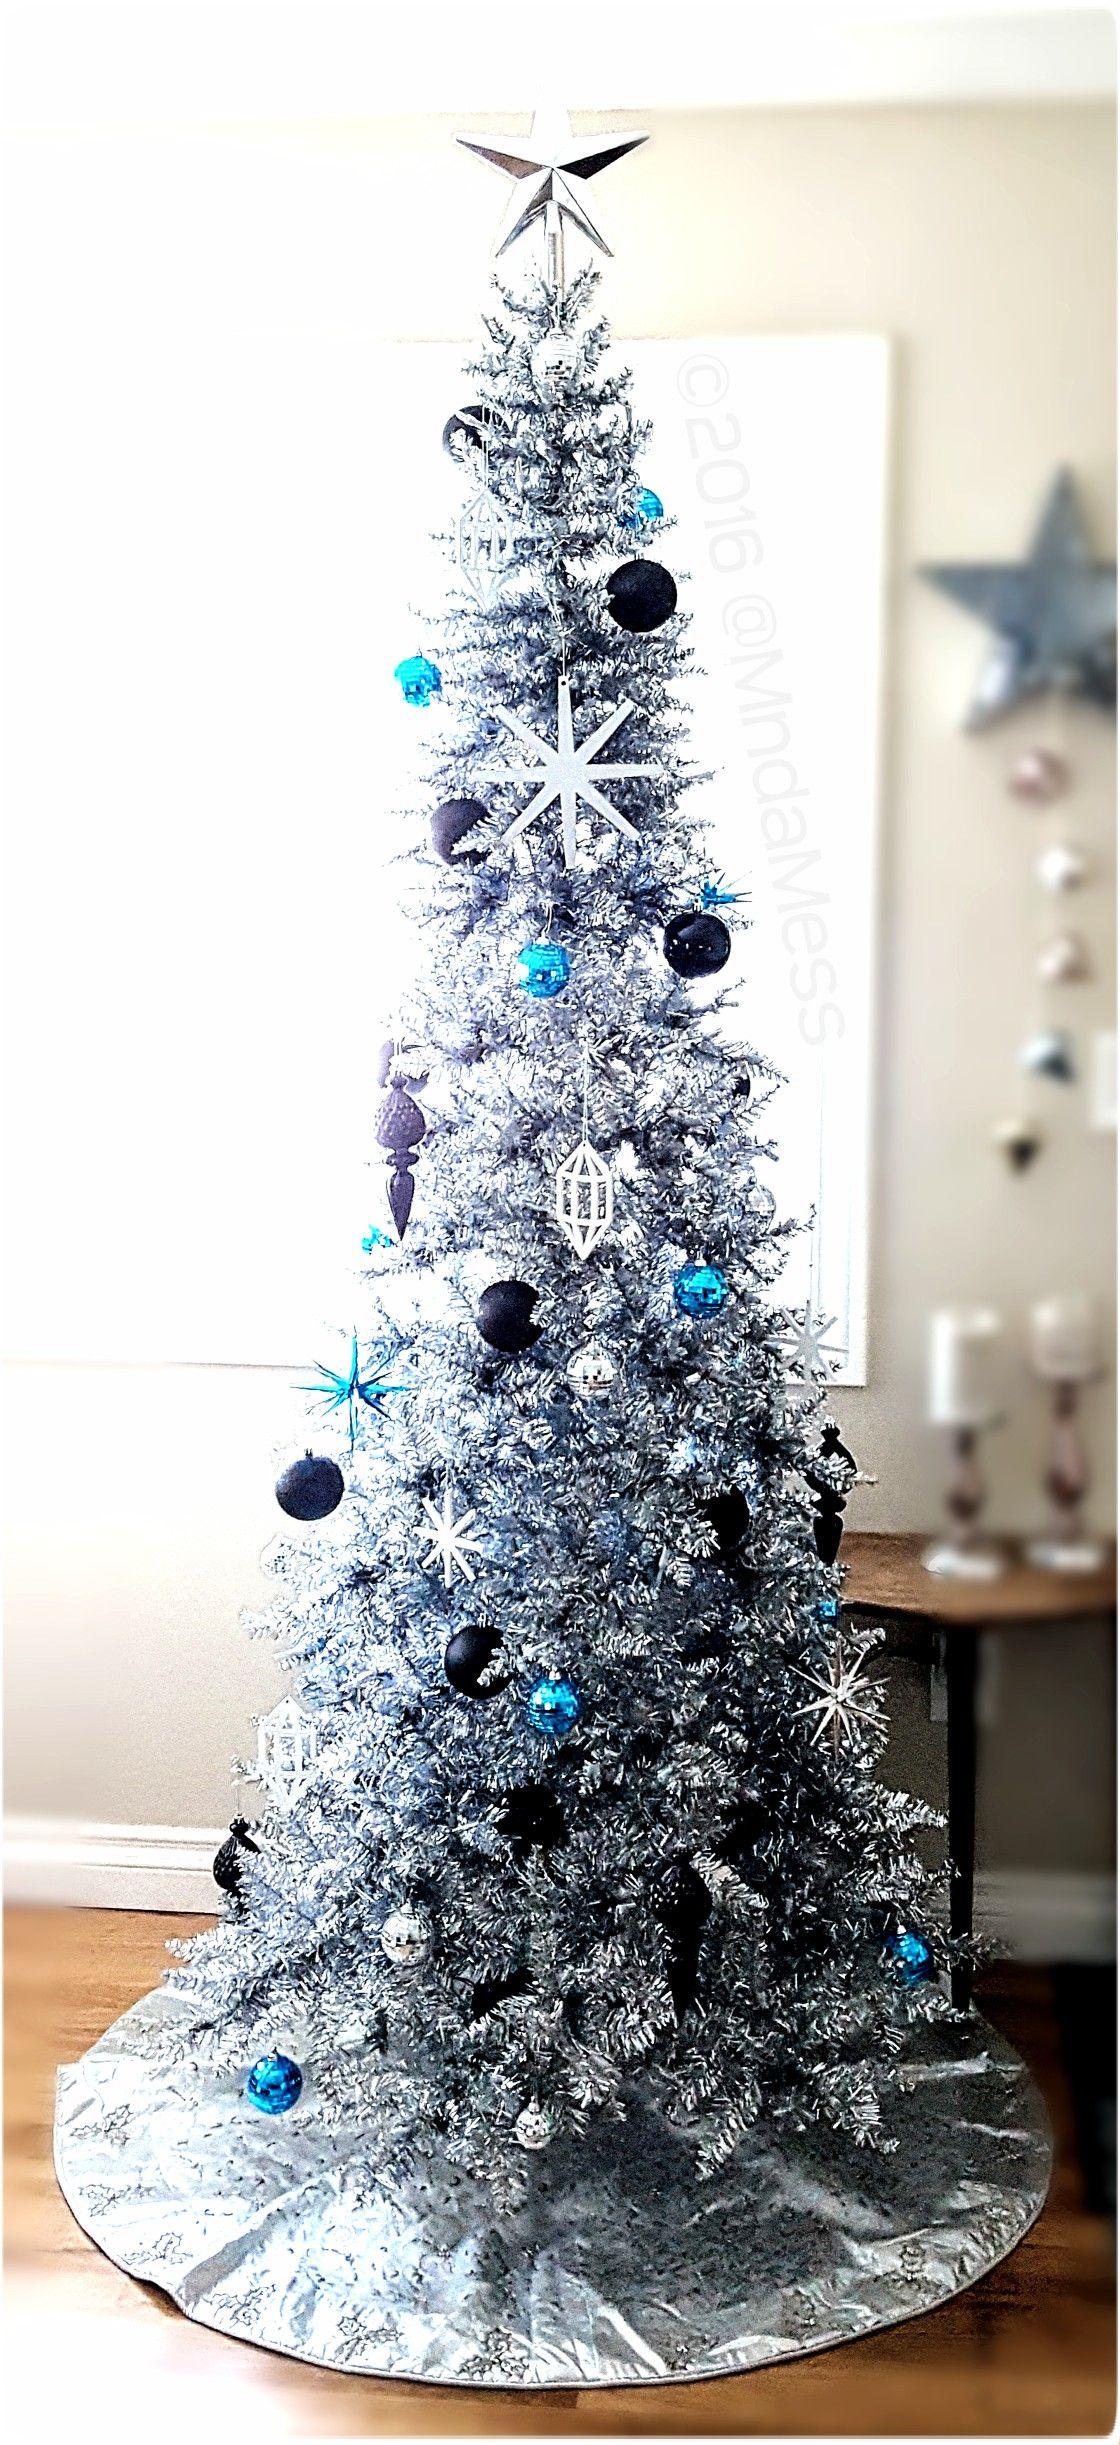 Narrow Silver Christmas Tree W Black Blue White Silver Ornaments 2016 White Christmas Tree Decorations Silver Christmas Tree Christmas Tree Colour Scheme